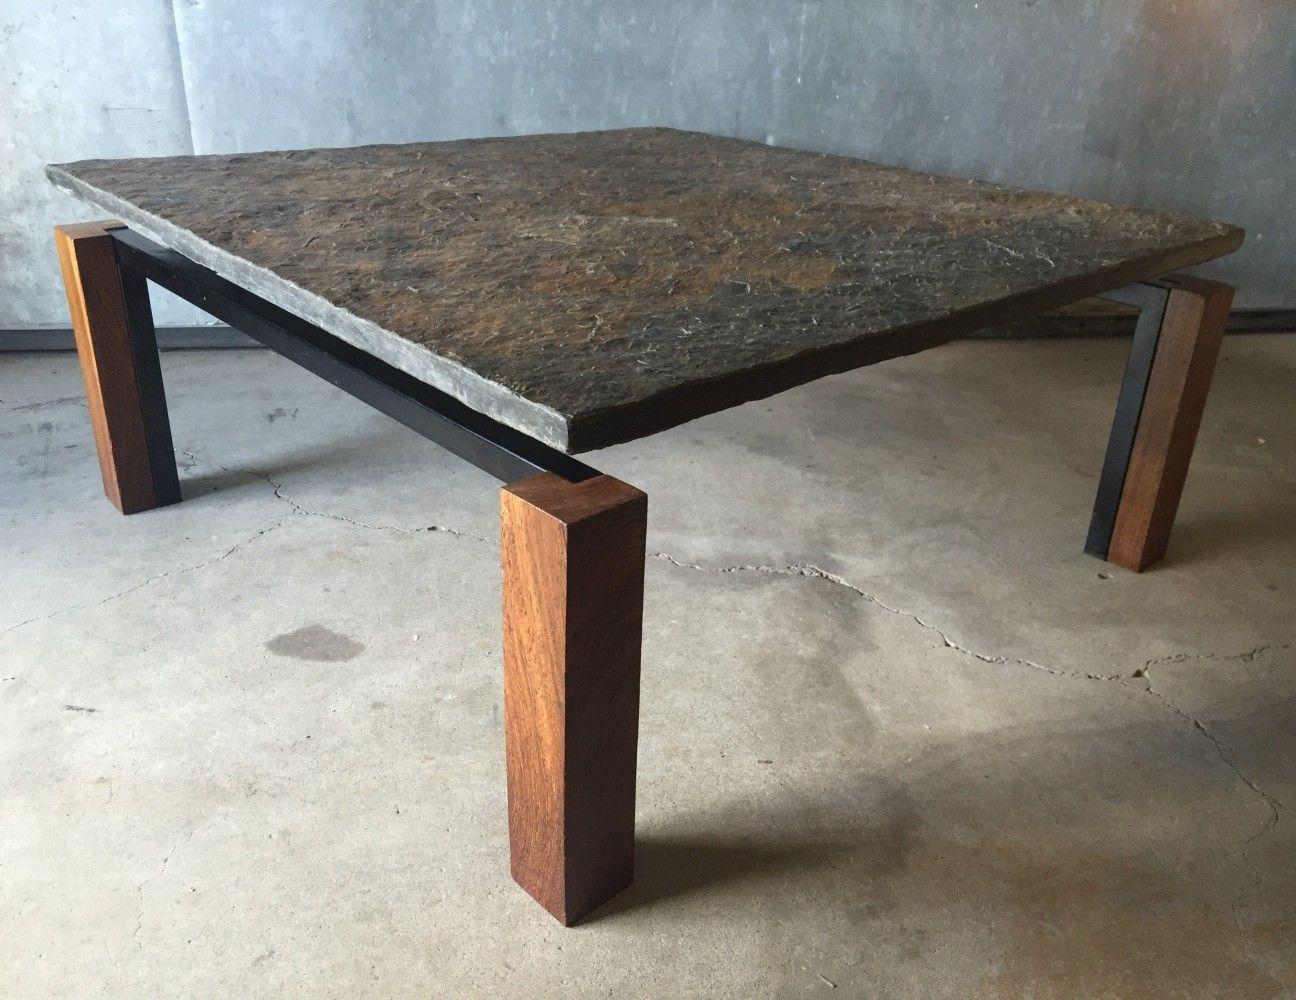 Slate Stone Wenge Wood Black Metal Square Coffee Table 1960s Coffee Table Square Slate Stone Wenge Wood [ 1000 x 1296 Pixel ]